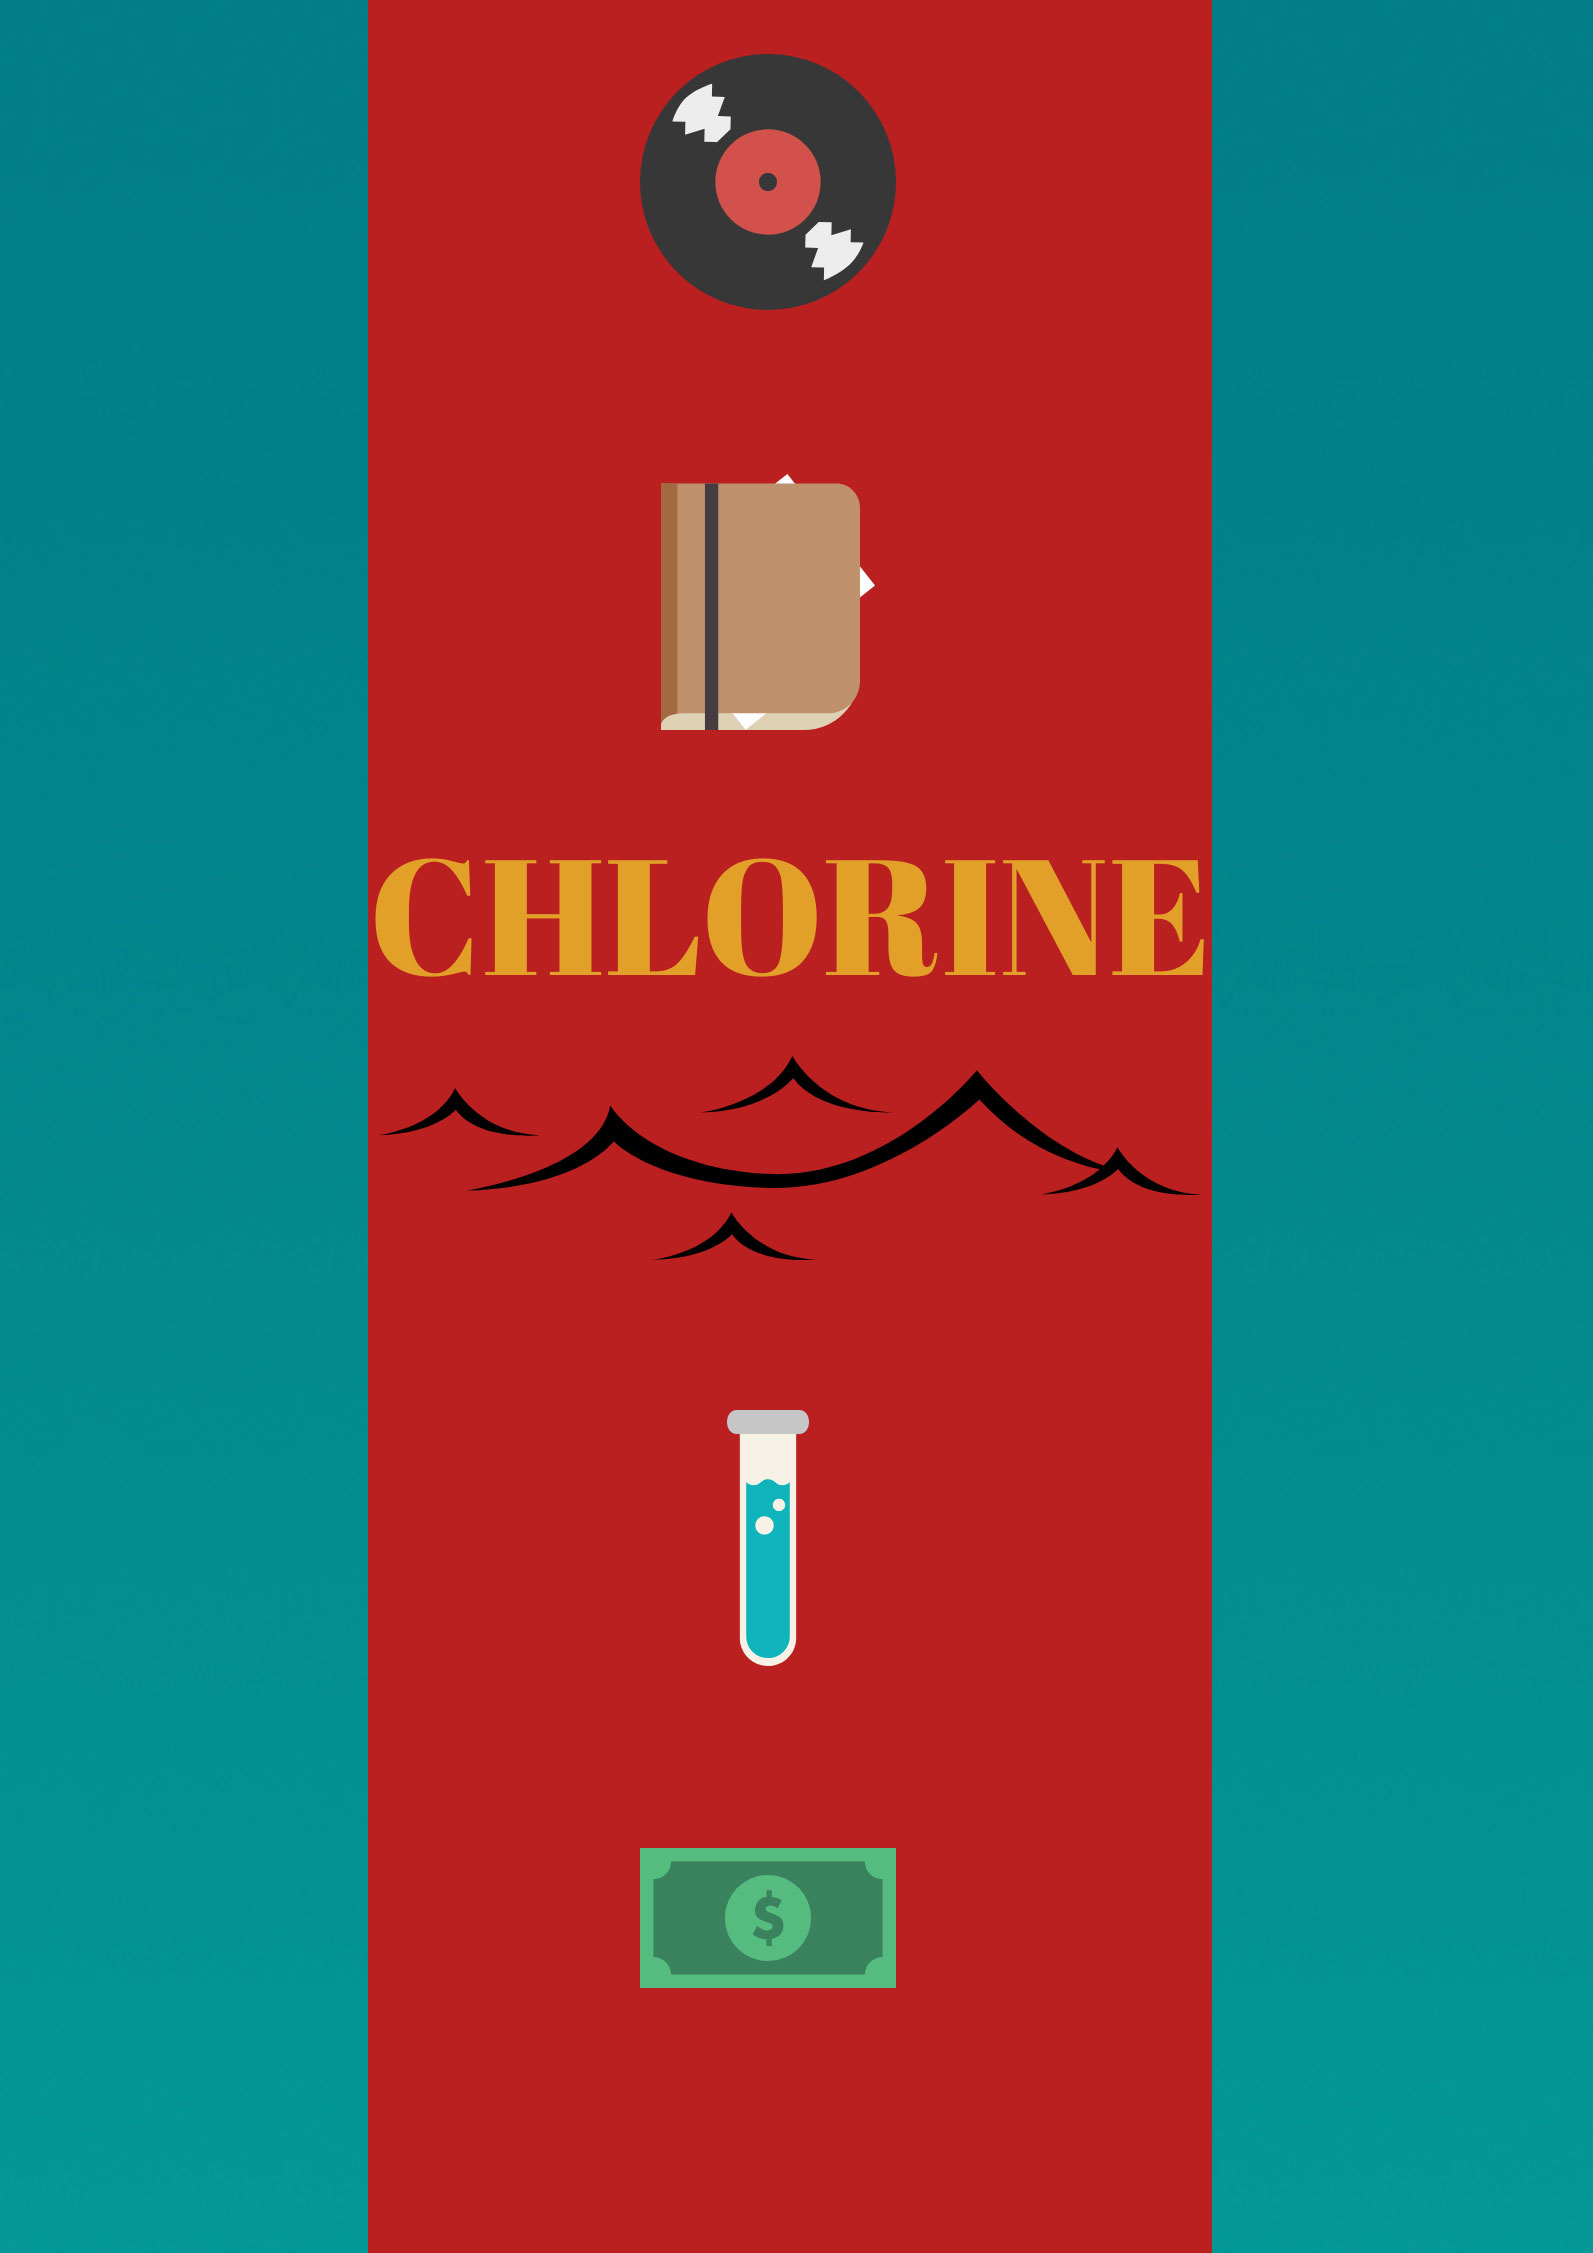 Chlorine - main image